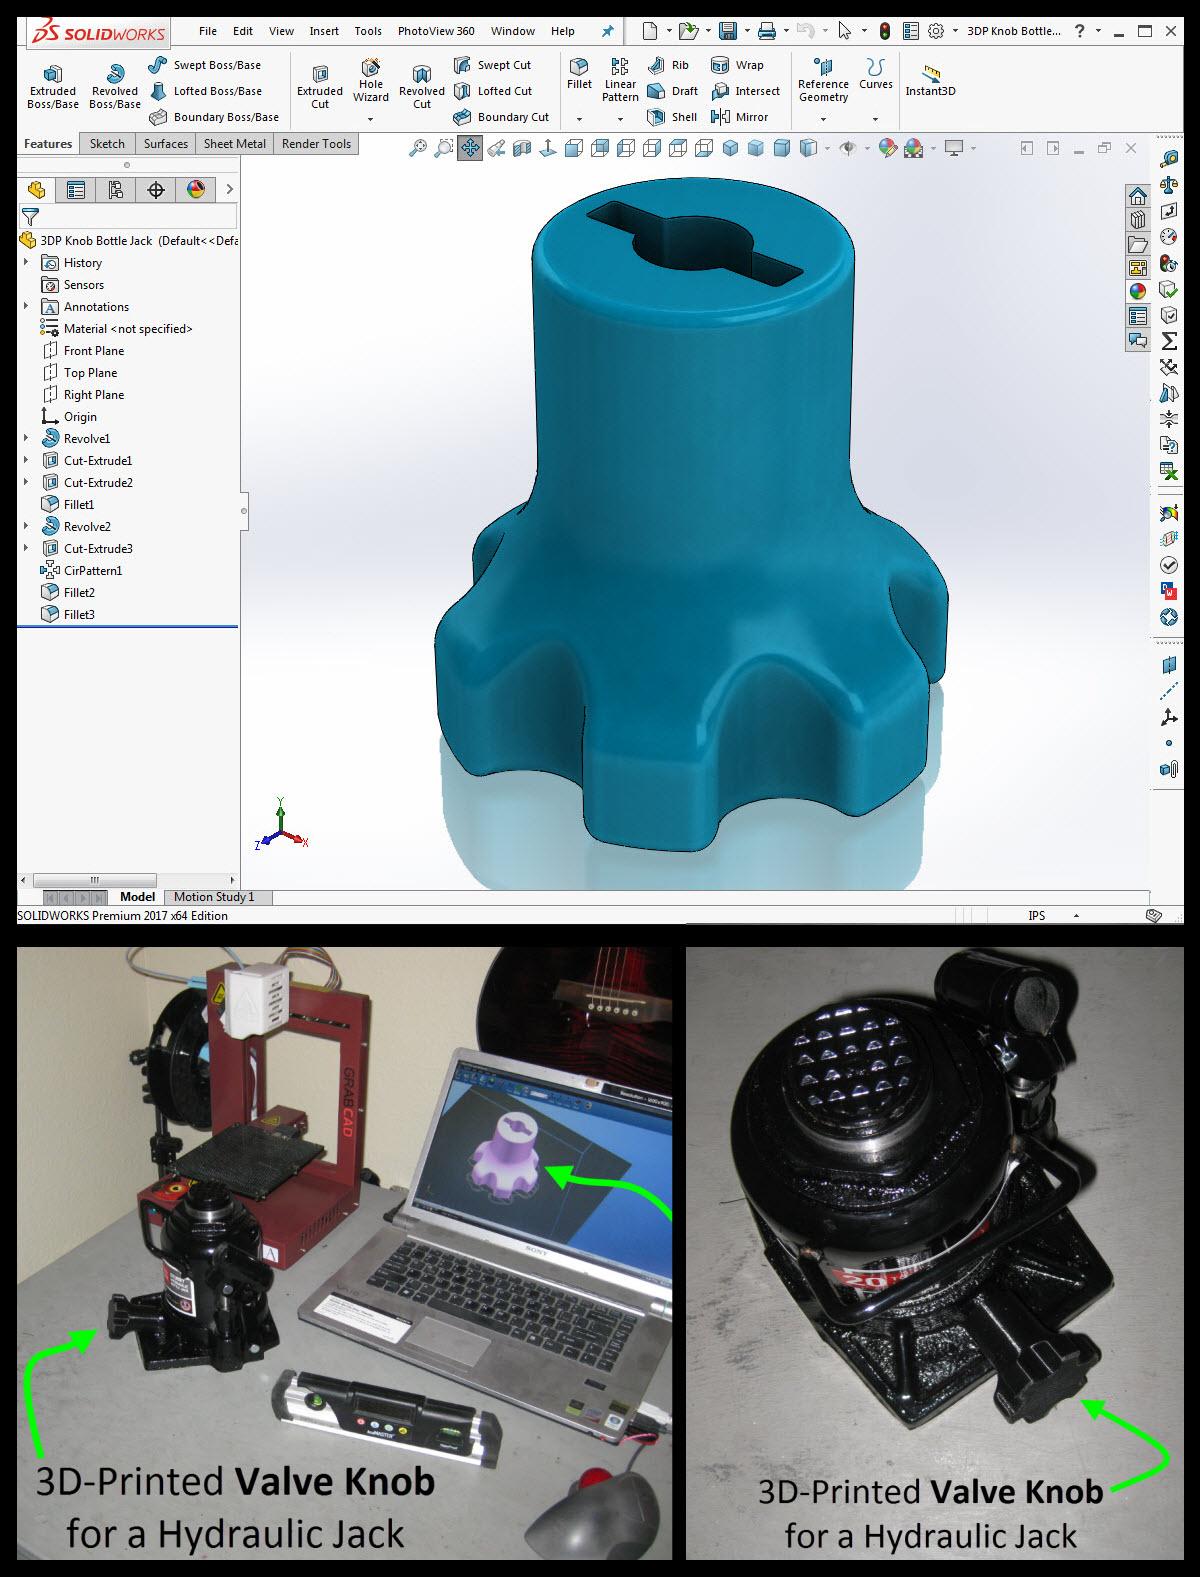 3d printed low profile jack knob 3d printed hydraulic jack knob ctm projects